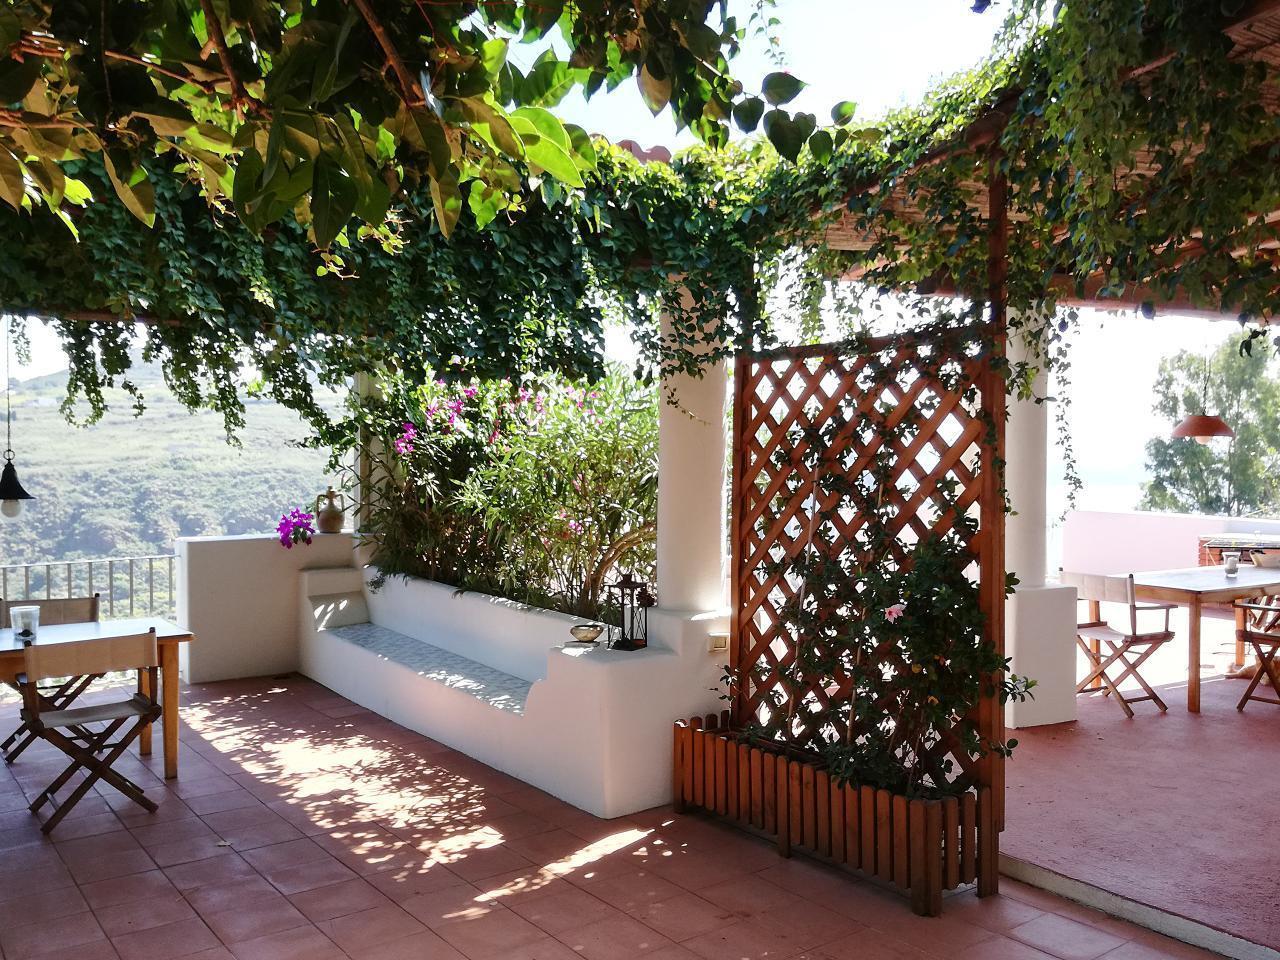 Maison de vacances Ferienhaushälfte Solandra auf sizilianischer Insel mit atemberaubenden Meeres-Rundblick (2038046), Lipari, Lipari, Sicile, Italie, image 50